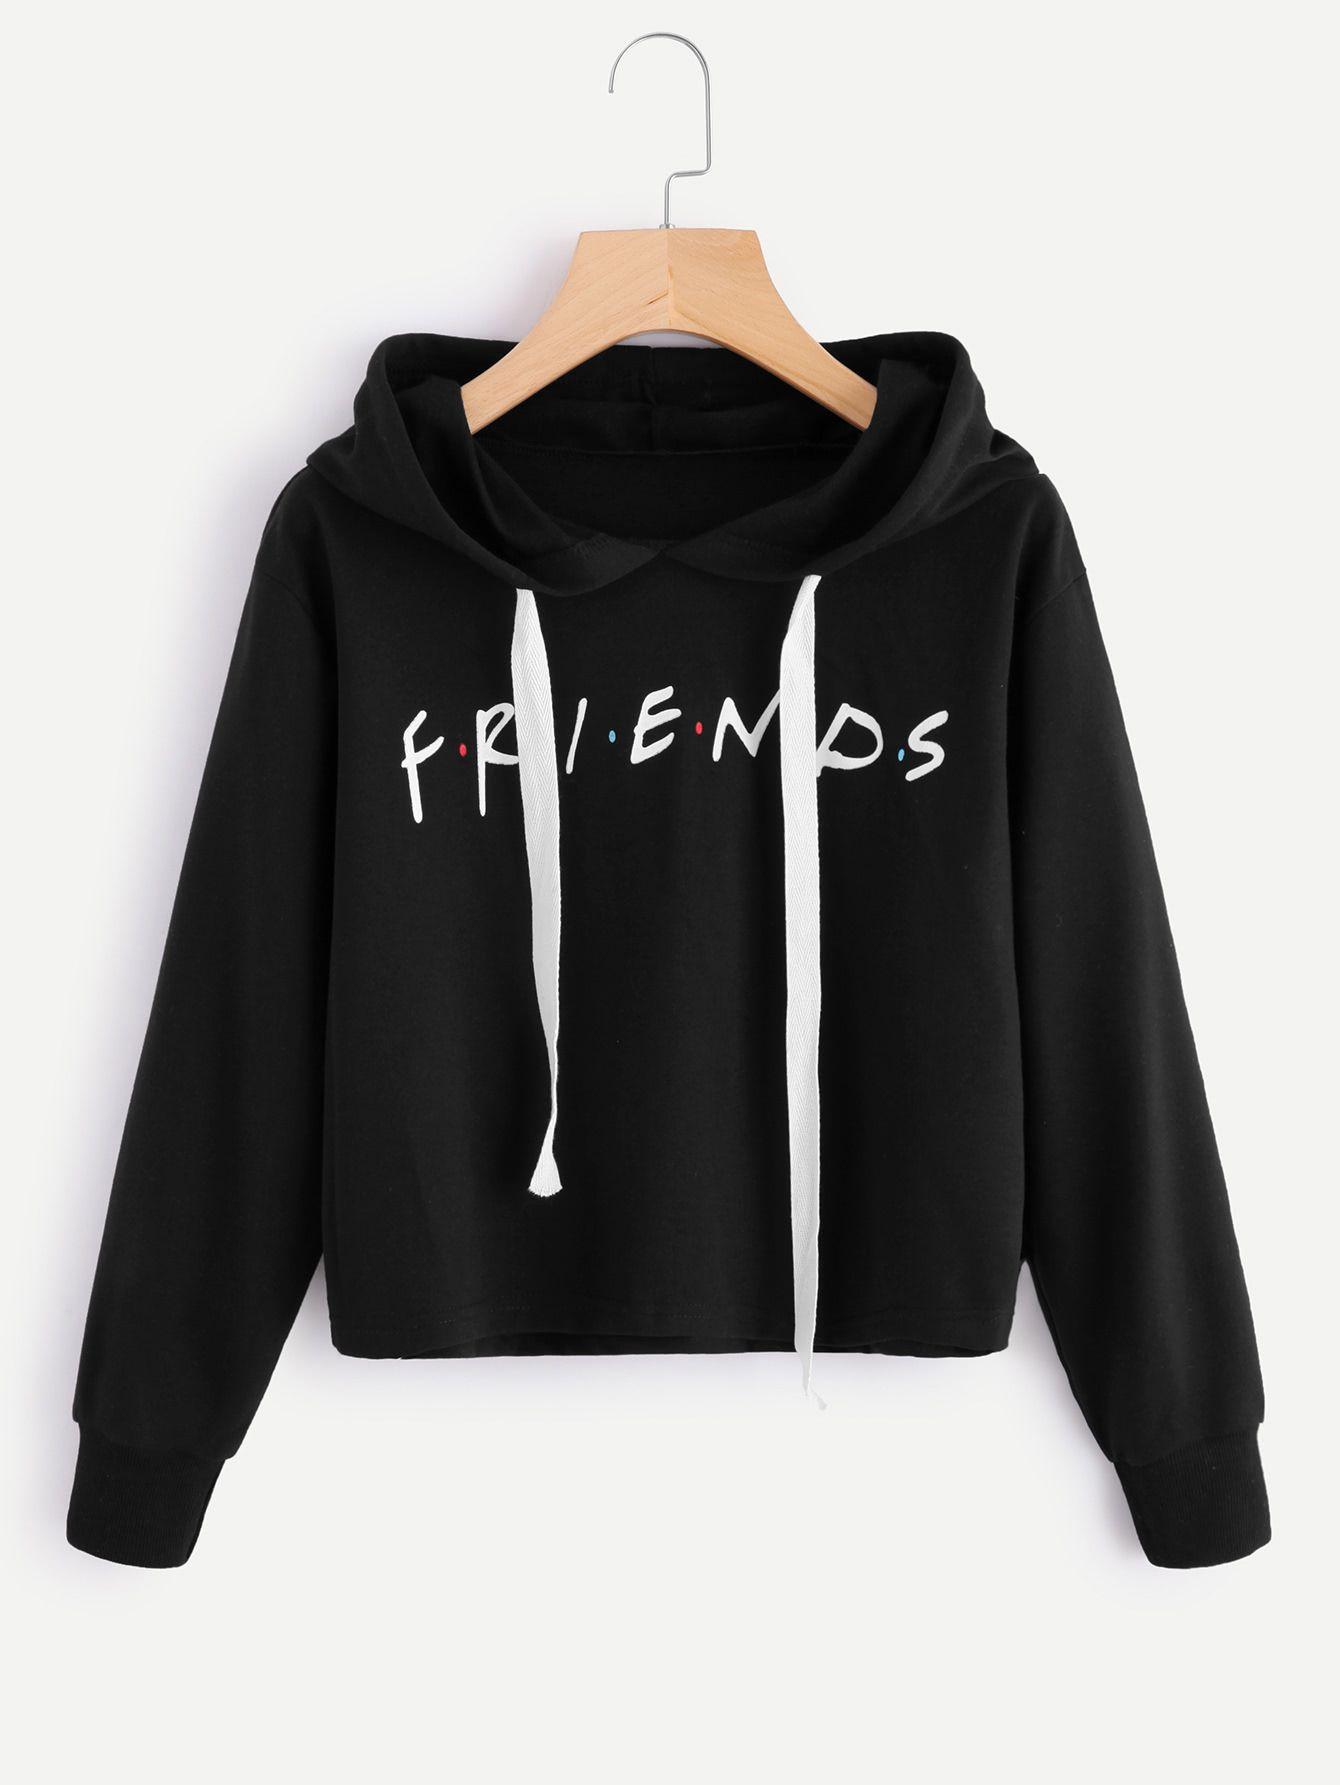 46f86a0fa44 Shop Friends Print Drop Shoulder Raw Hem Hoodie online. SheIn offers Friends  Print Drop Shoulder Raw Hem Hoodie & more to fit your fashionable needs.